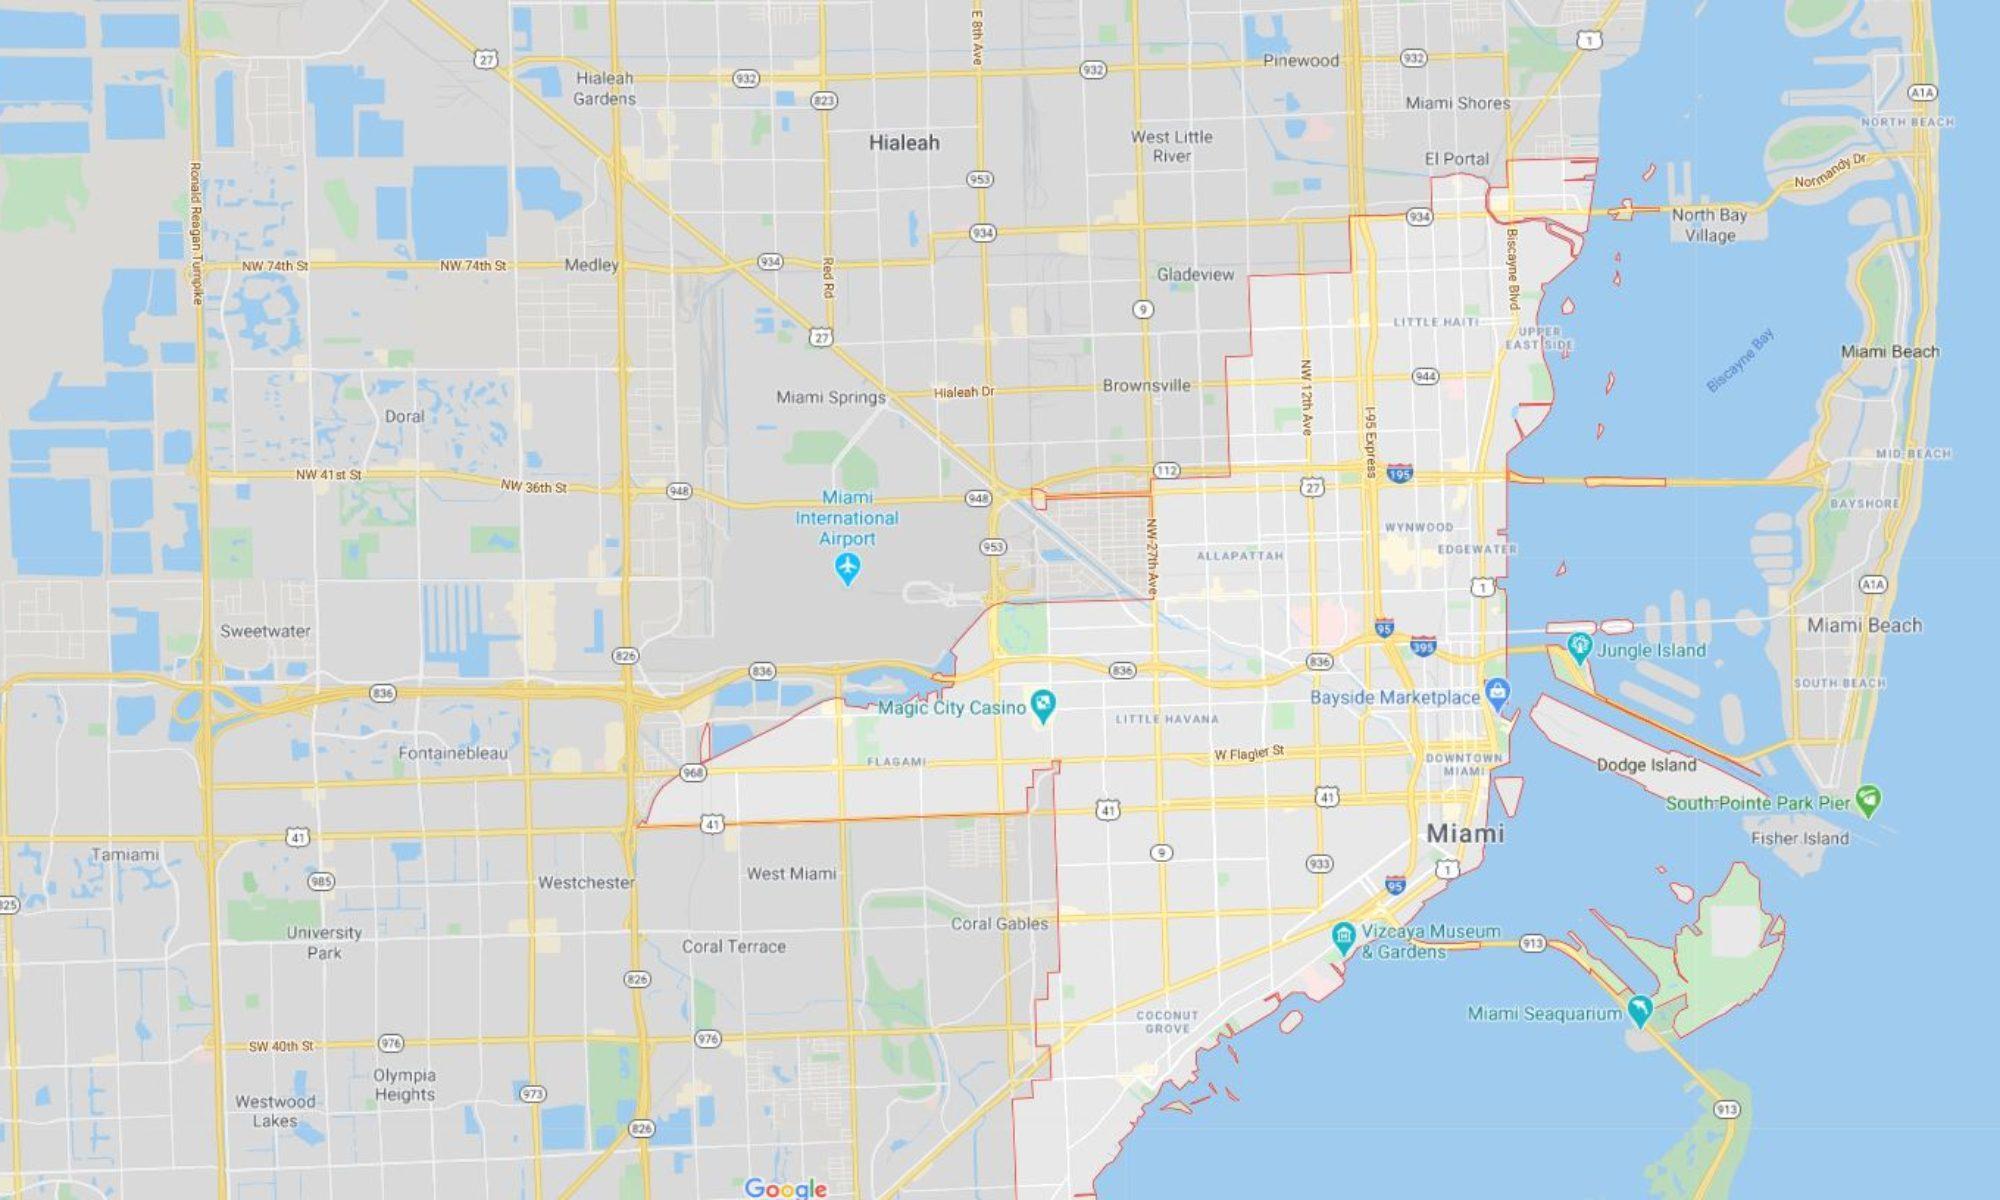 Podiatry Miami